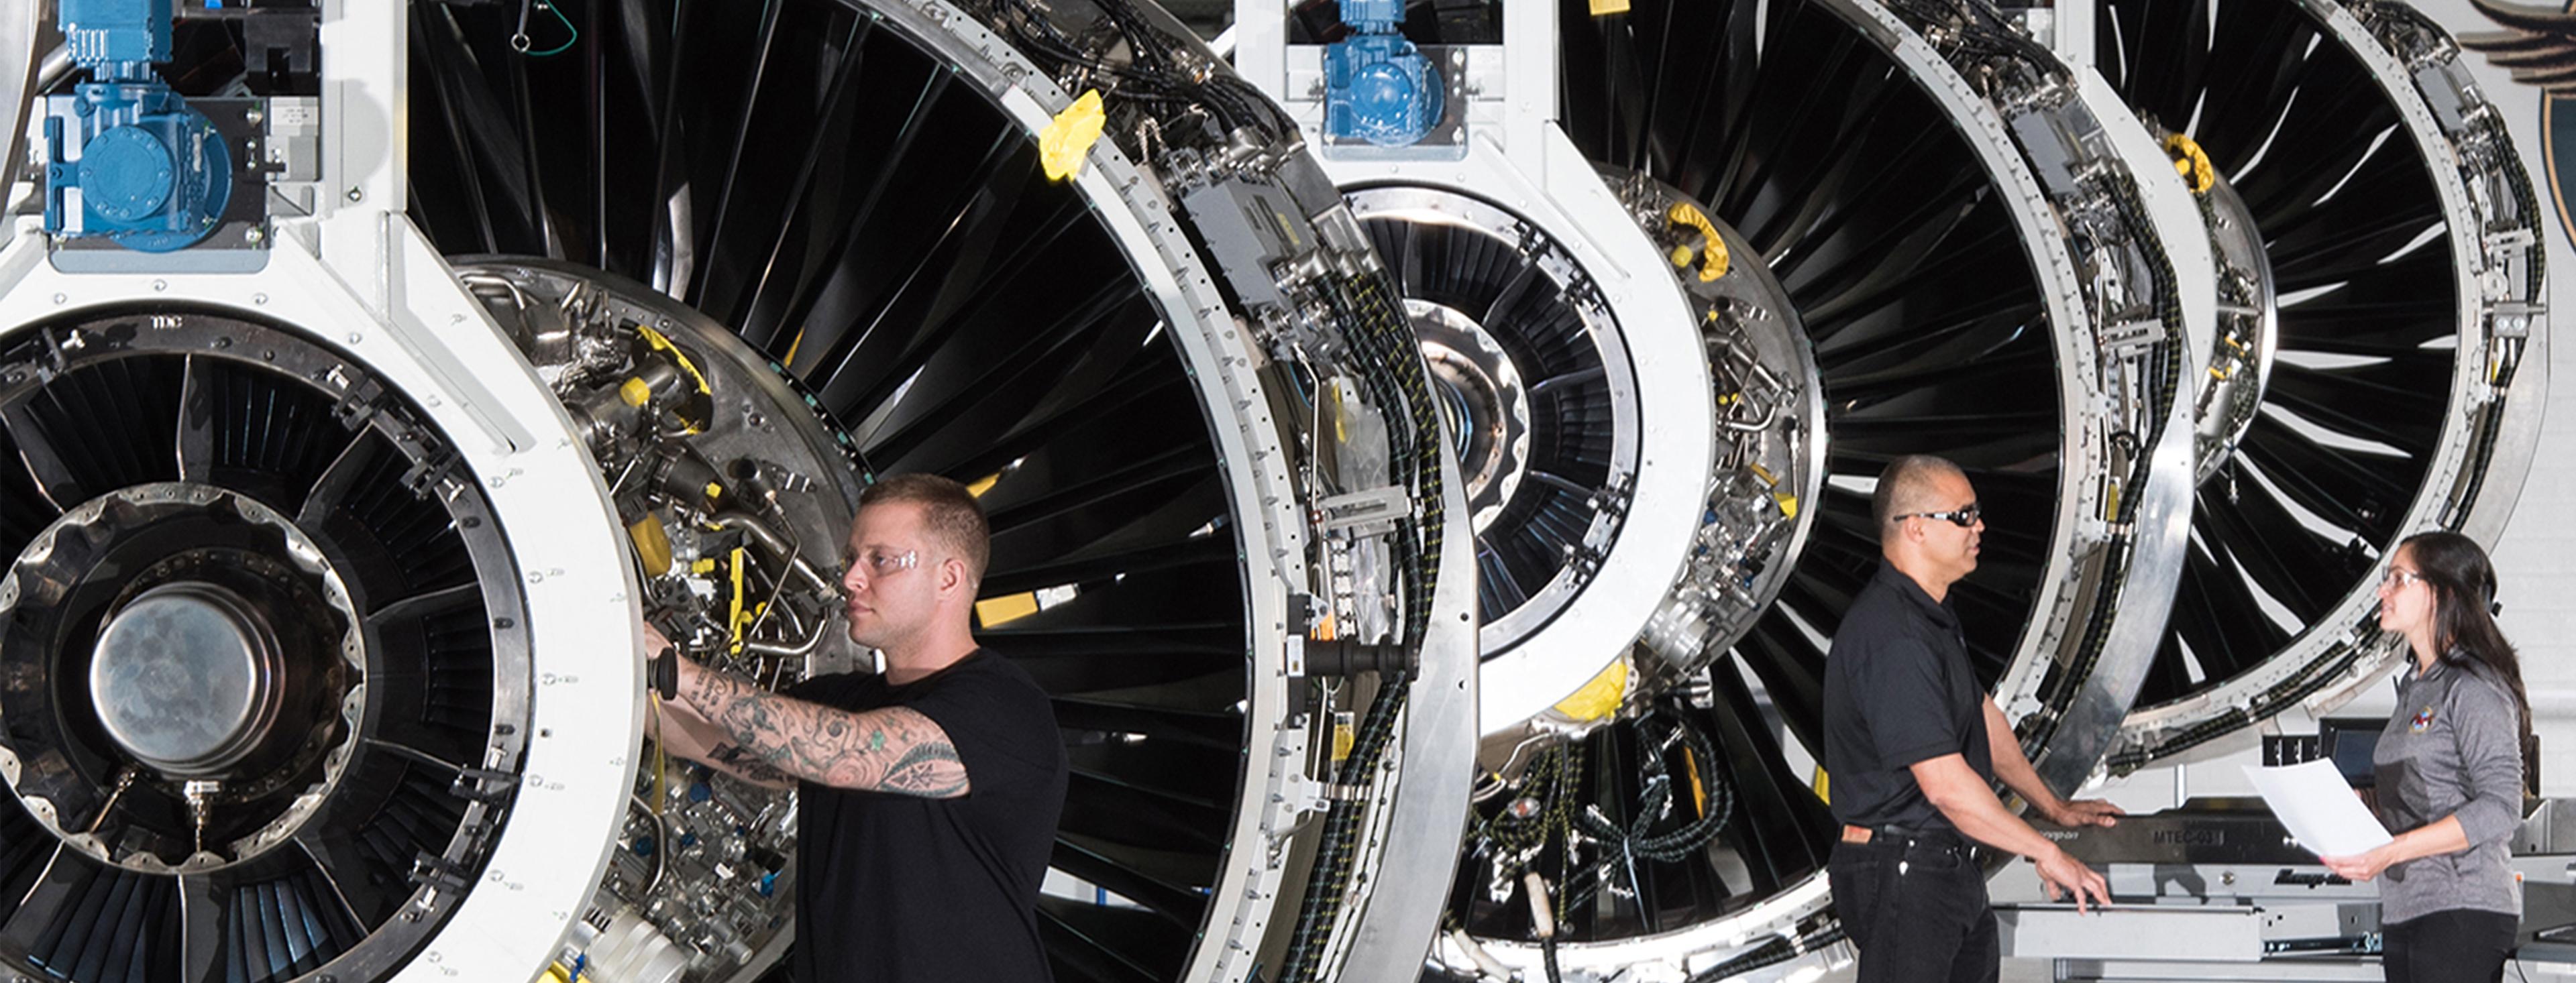 Courtesy of United Technologies Corporation — Pratt & Whitney Division.